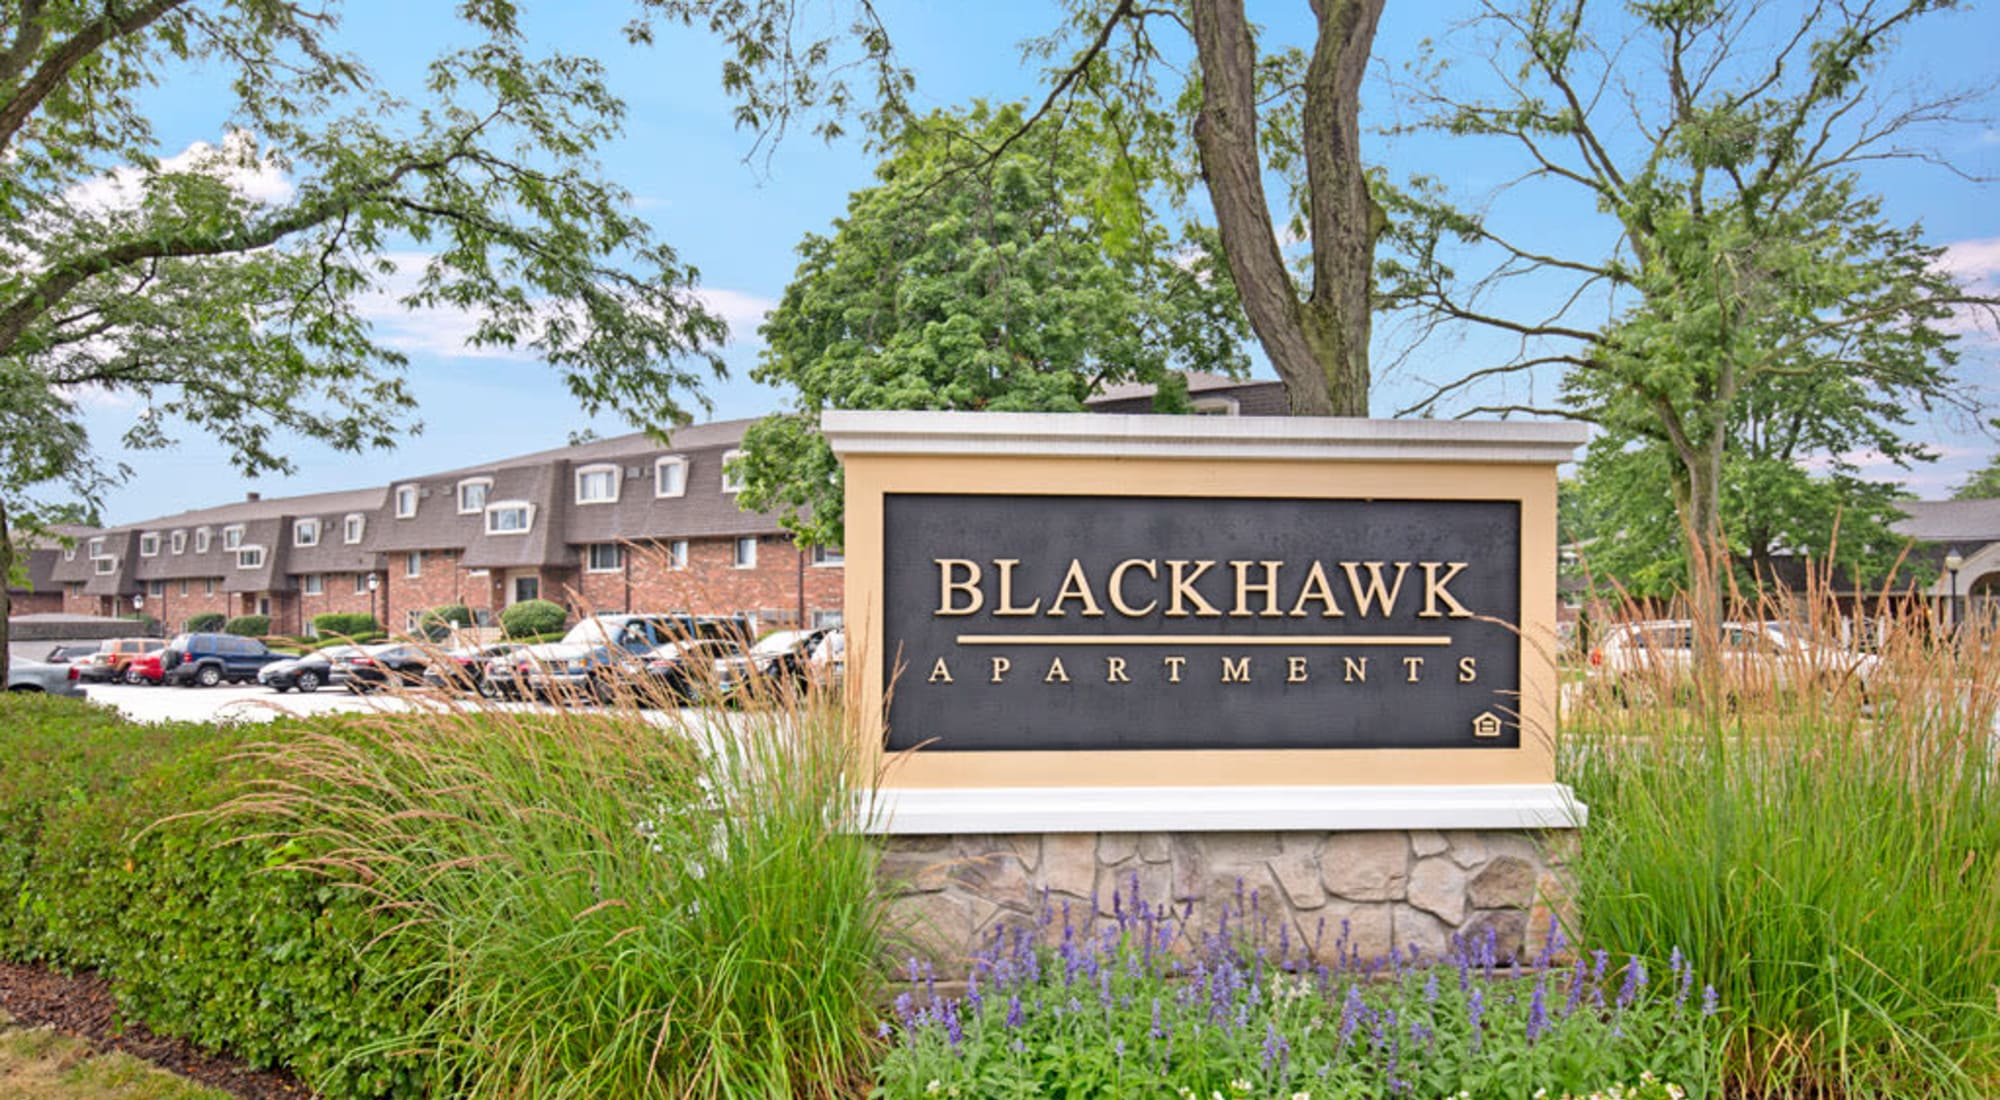 Schedule your tour of Blackhawk Apartments in Elgin, Illinois